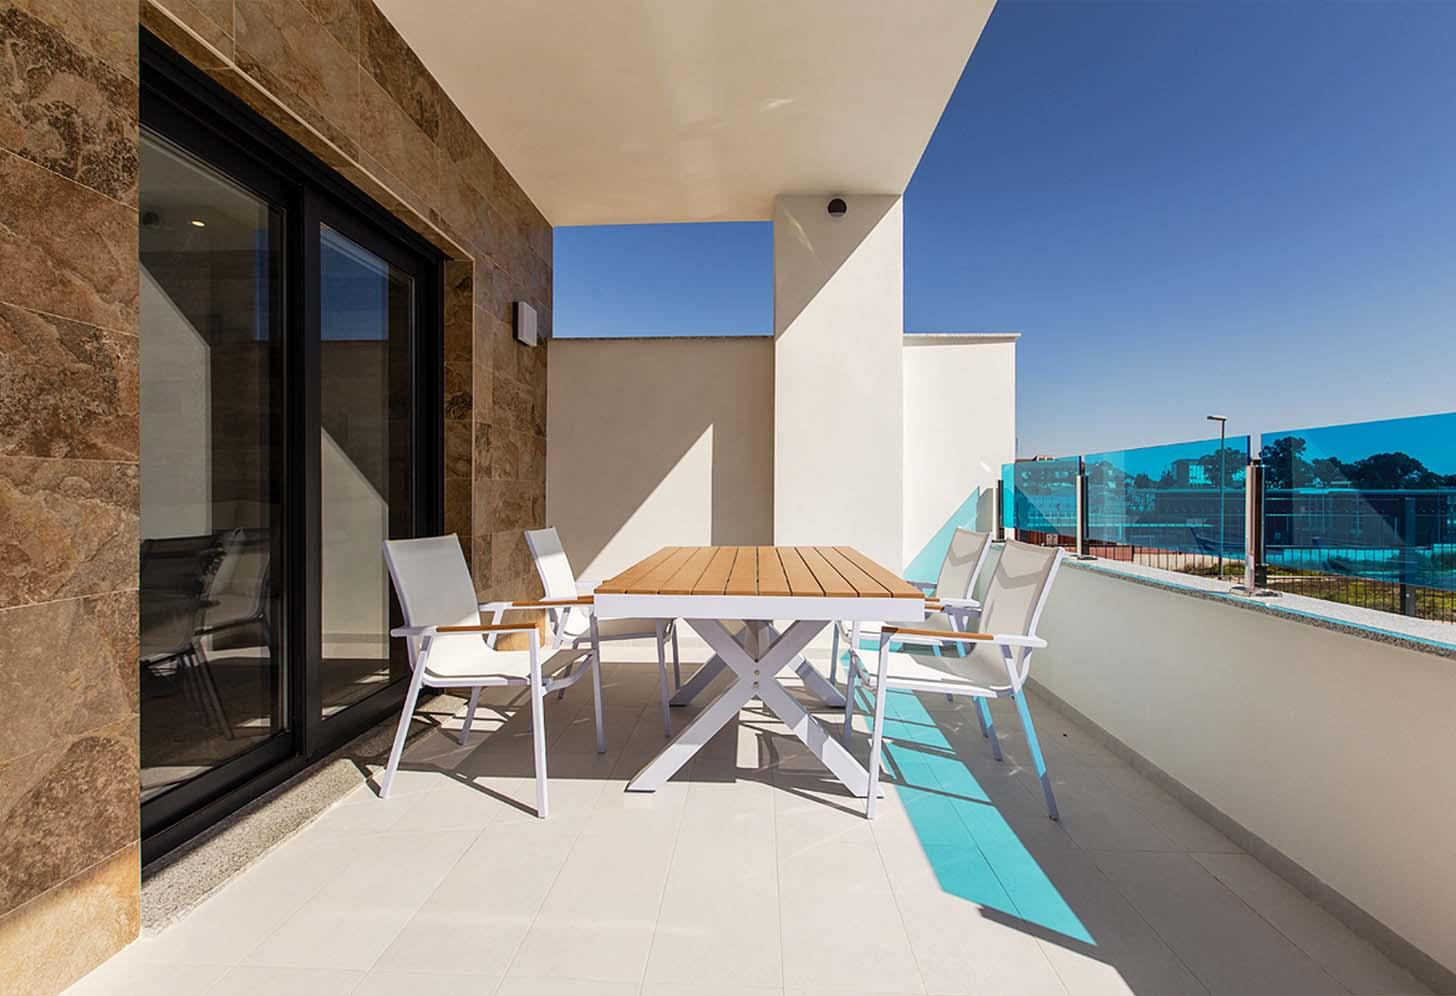 immobilier neuf espagne costa blanca nord on-f2 benijofar villas terrasse